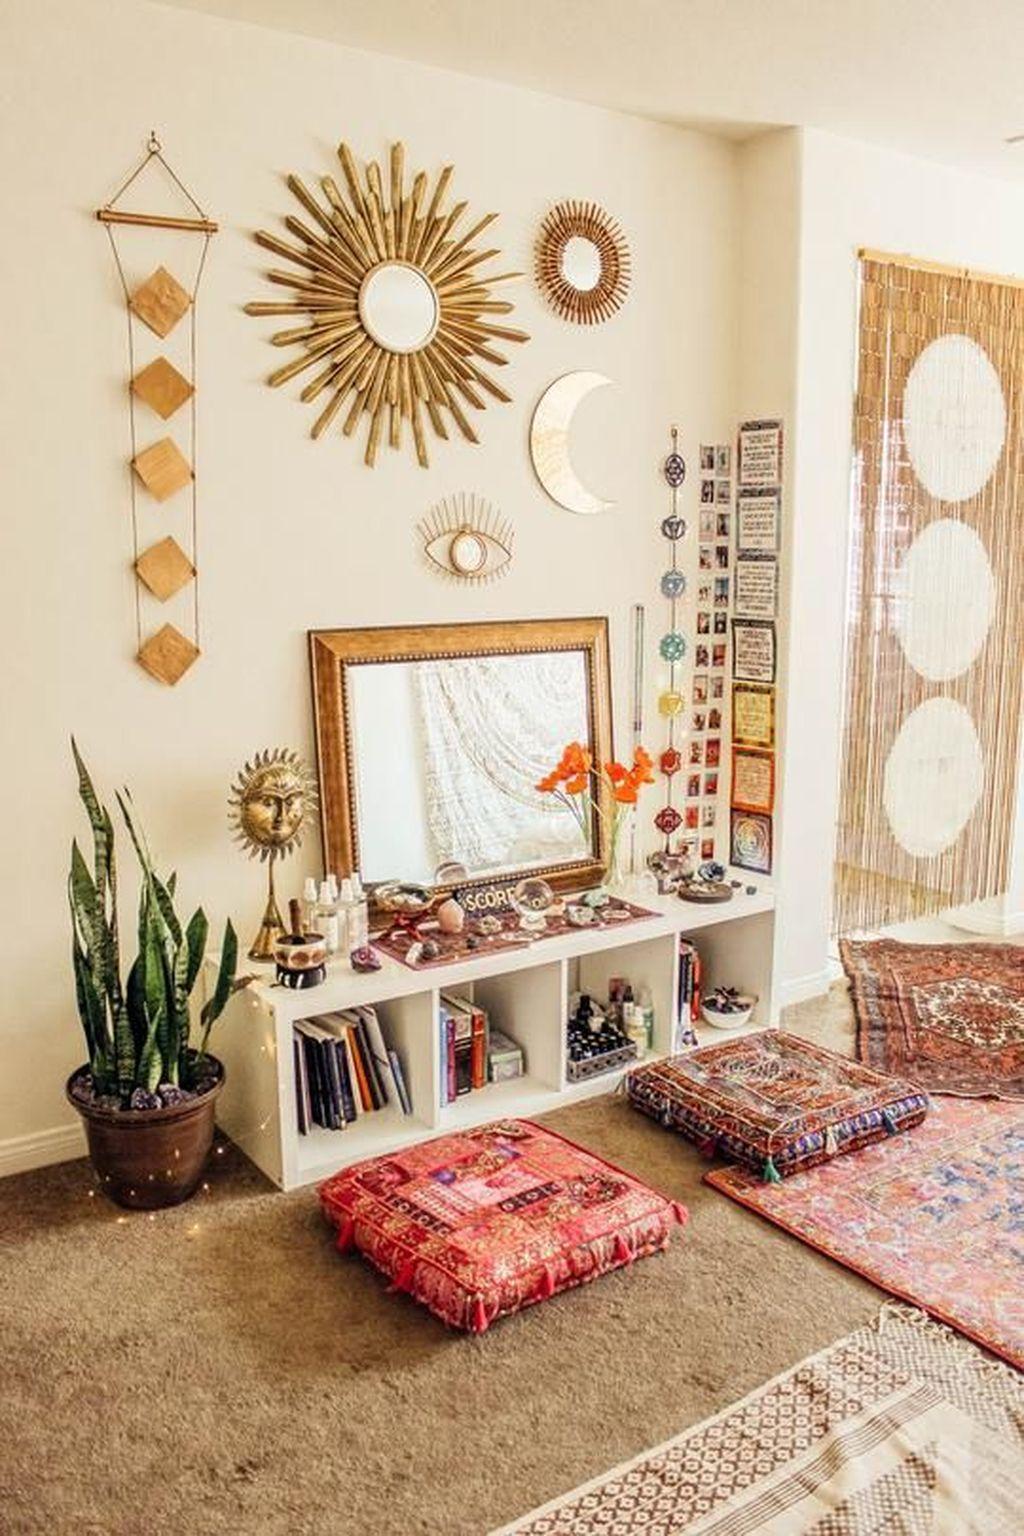 Stunning Hippie Room Decor Ideas You Never Seen Before 01 Hmdcrtn